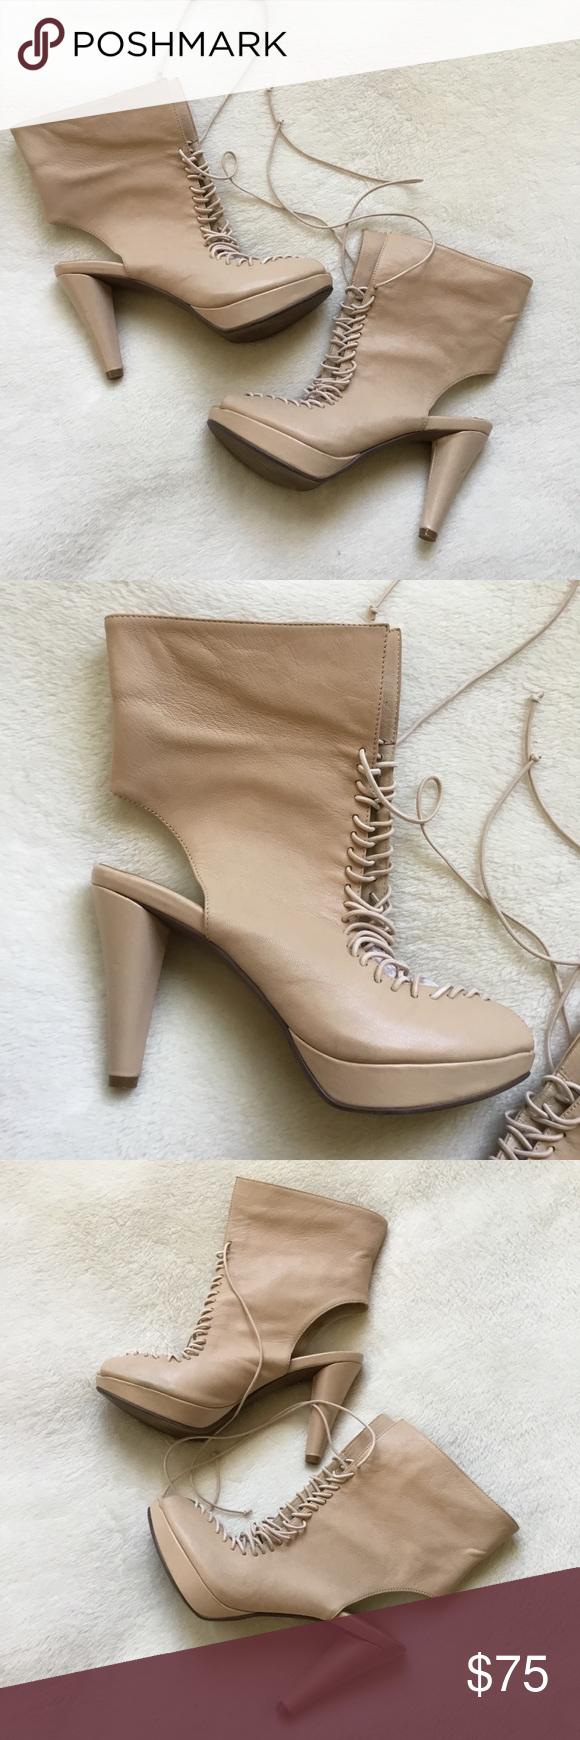 6663d12e38a Jeffrey Campbell beige nude platform boots 7.5 Fabulous beige nude leather  platform boots from Jeffrey